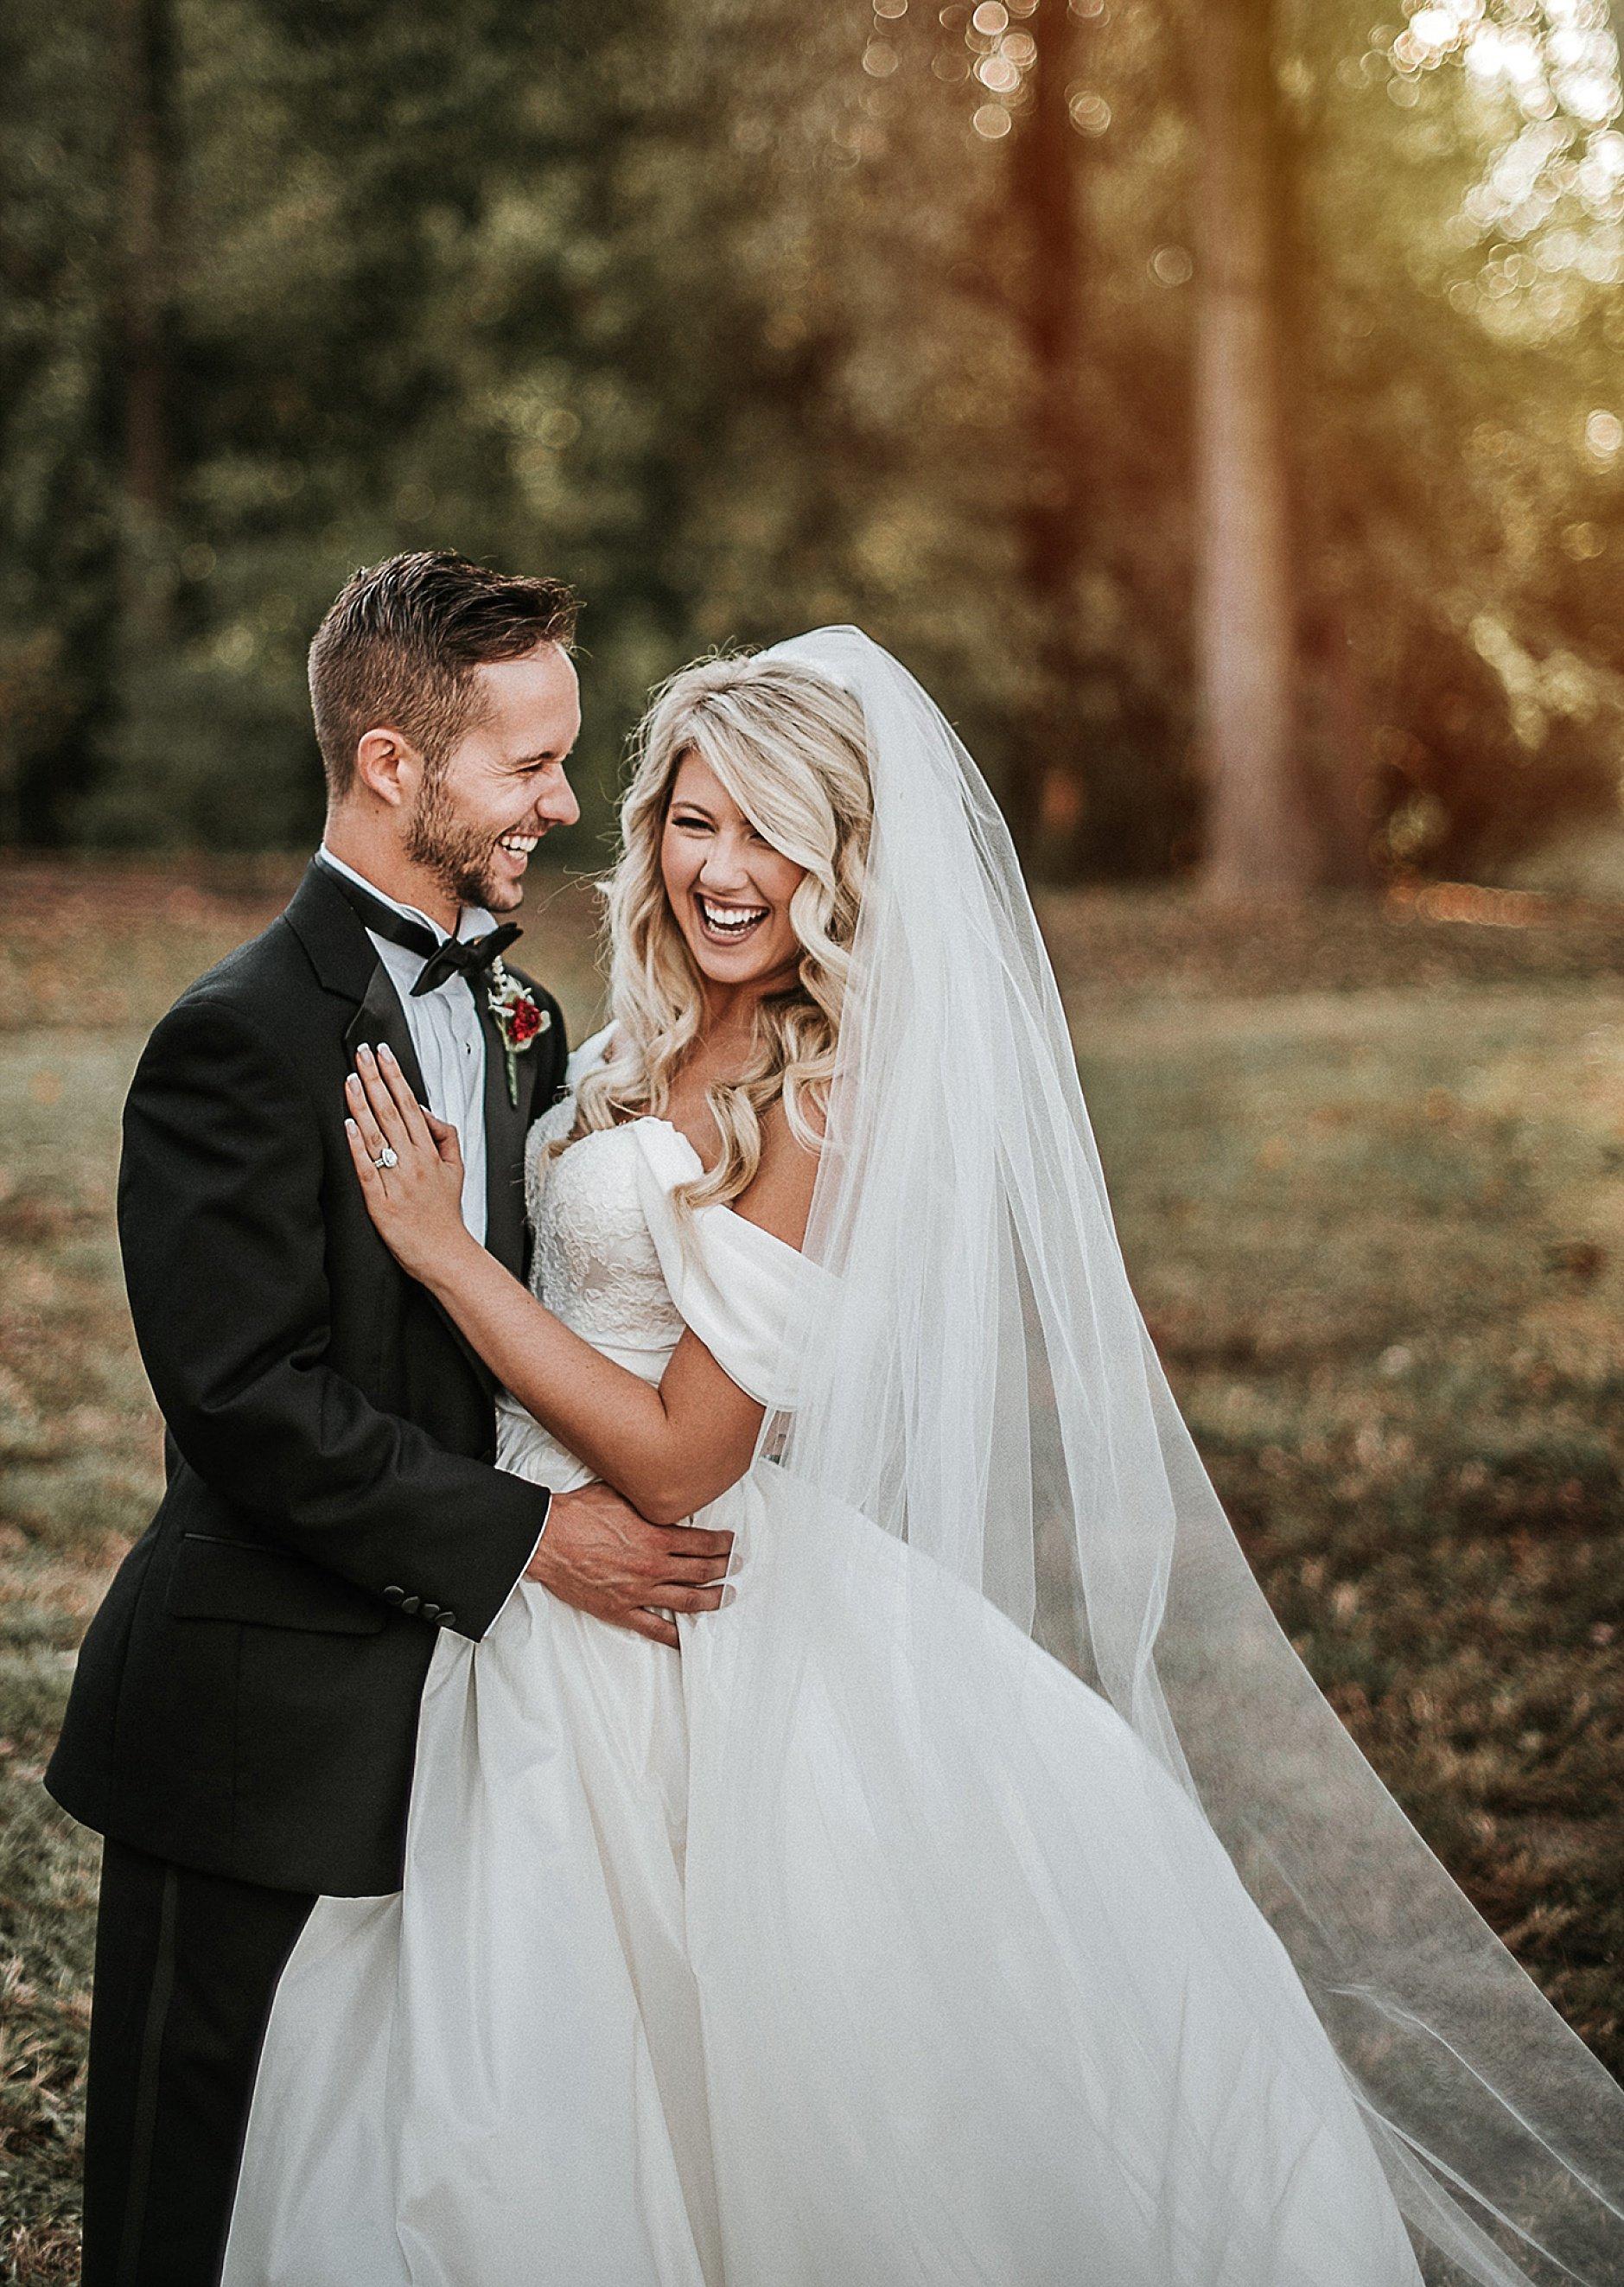 Best Wedding Photographers in the World